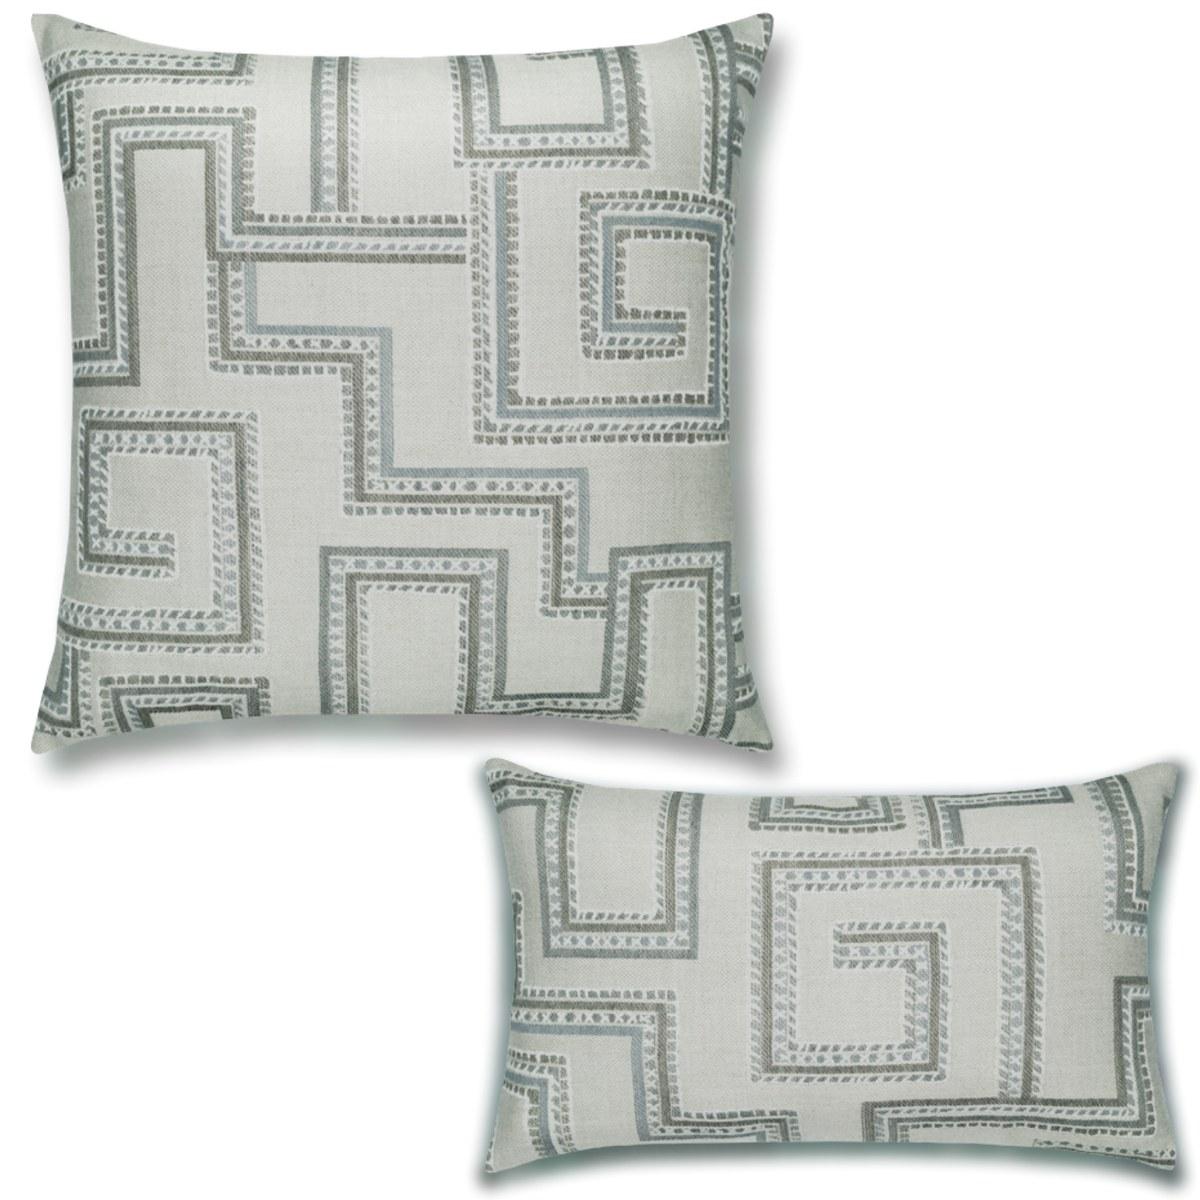 Sunbrella maze-pillow-set by Elaine Smith